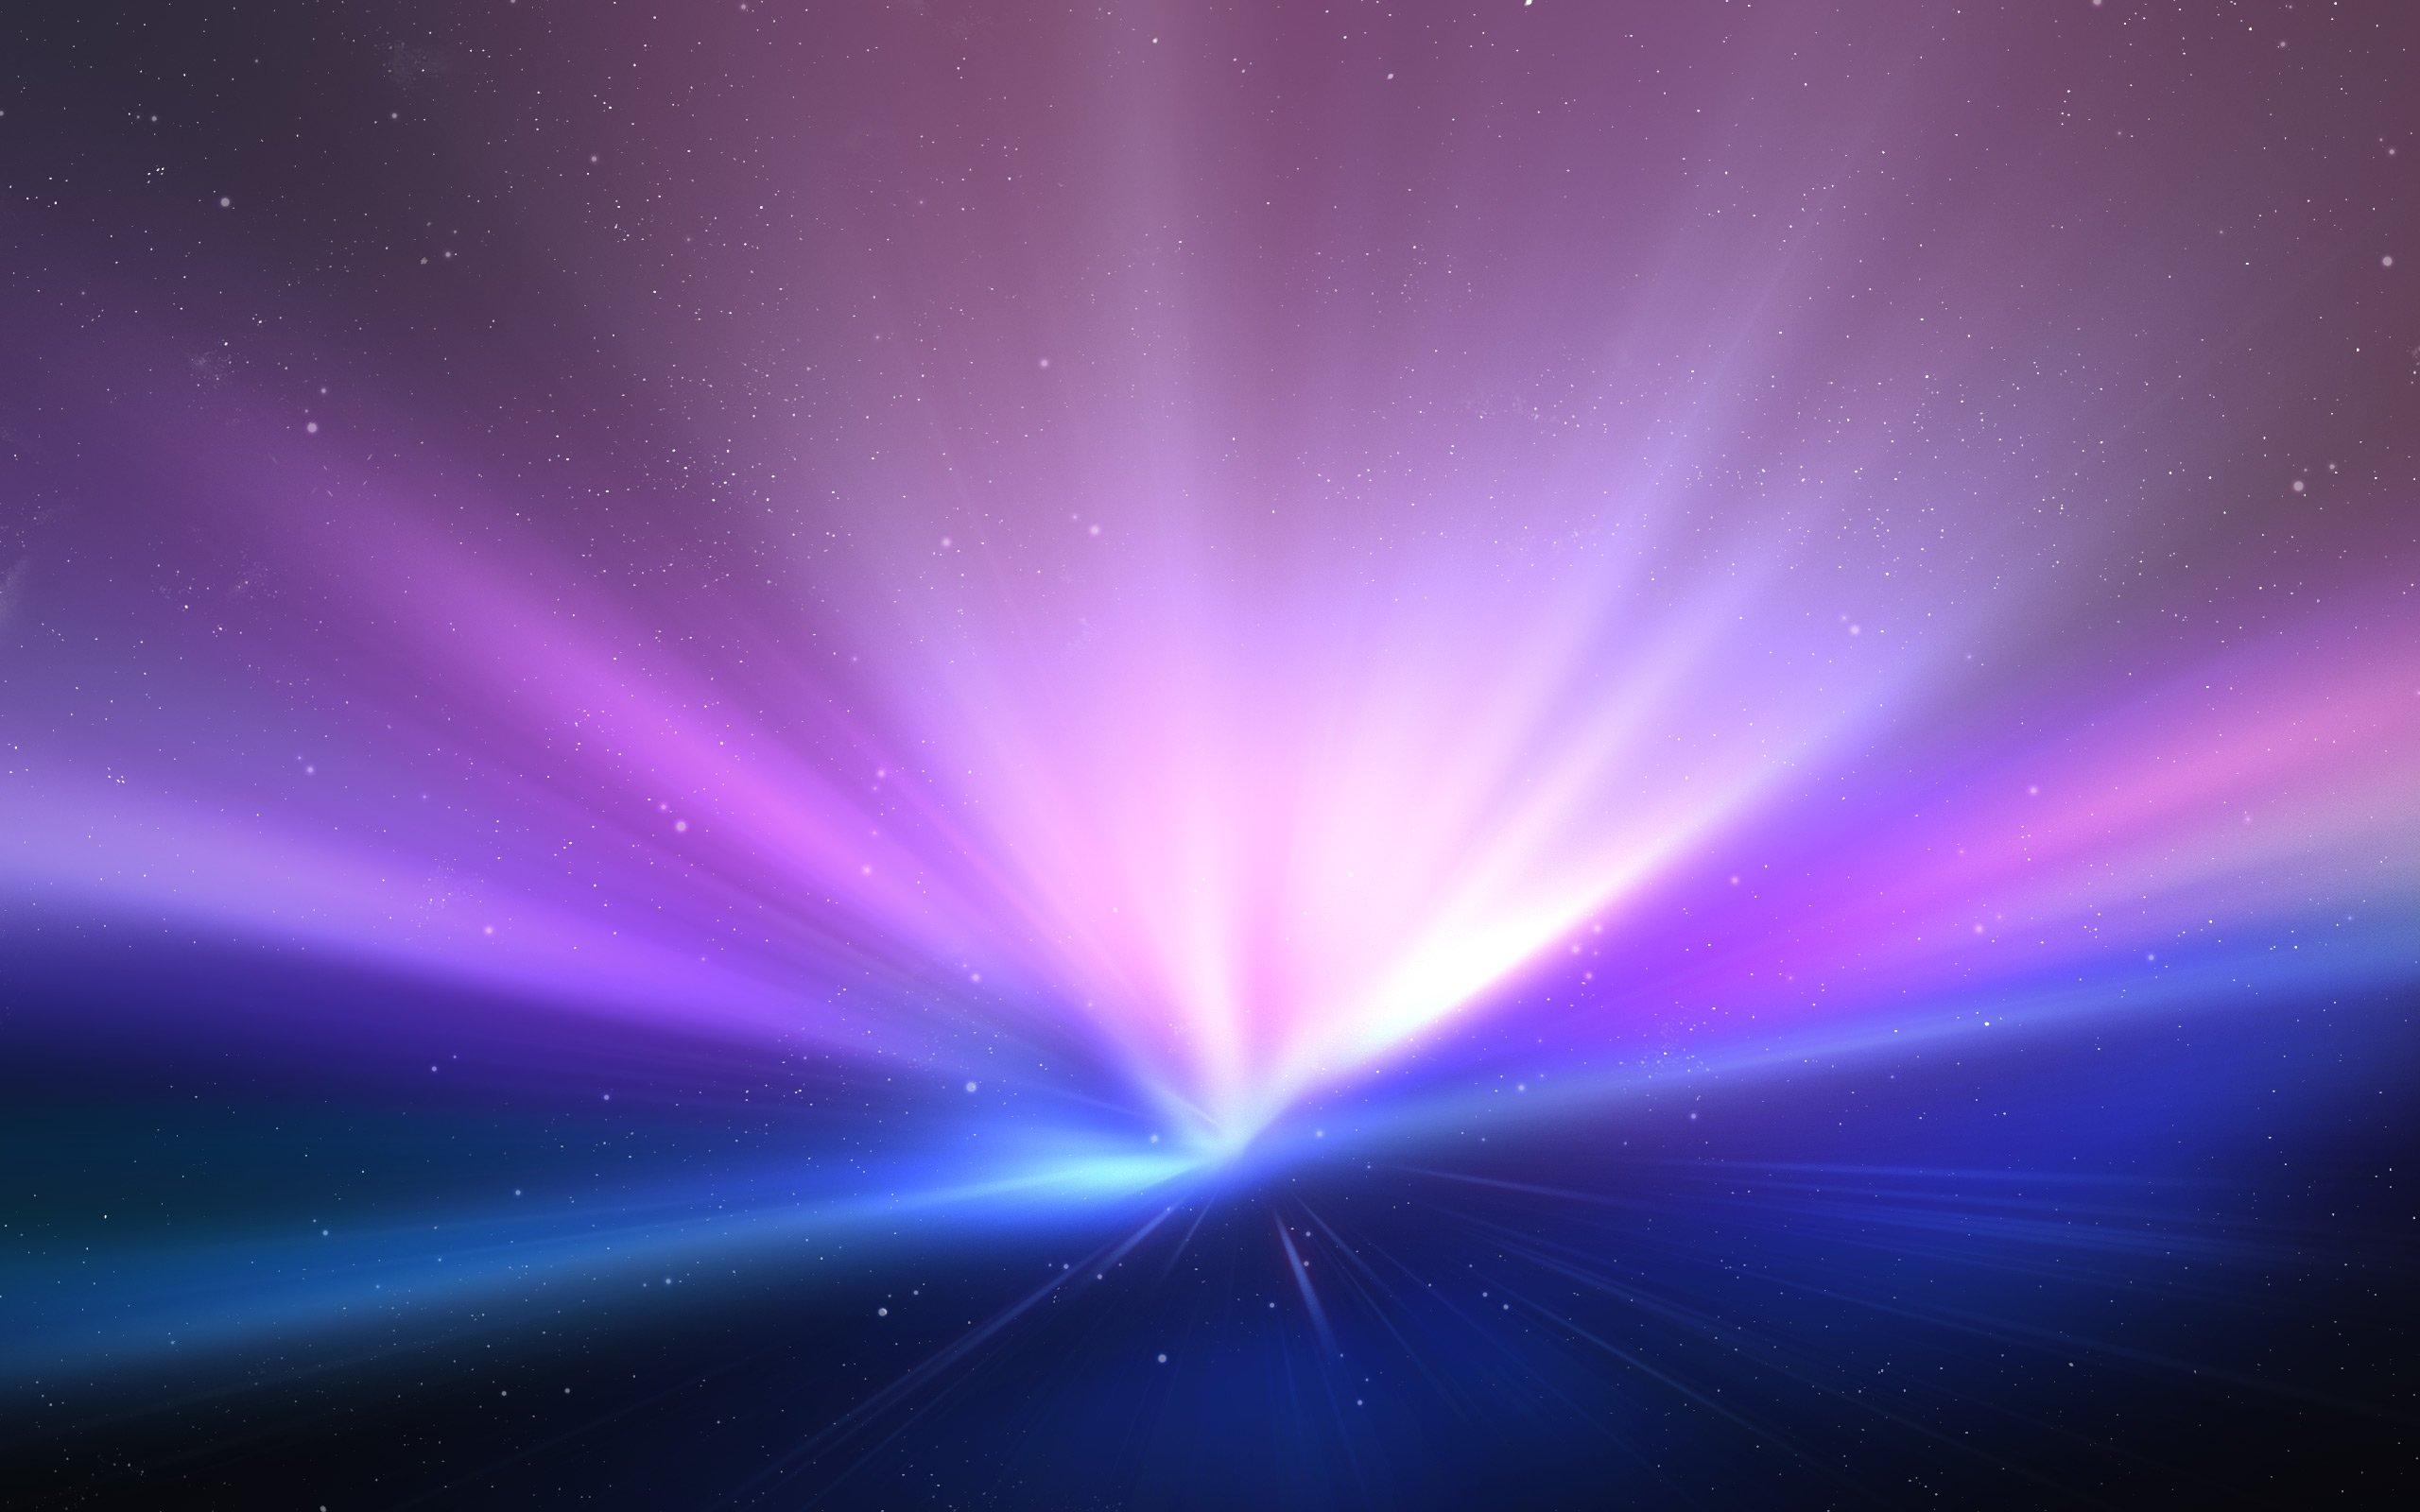 Mac Aurora Wallpaper 2560x1600 Mac, Aurora